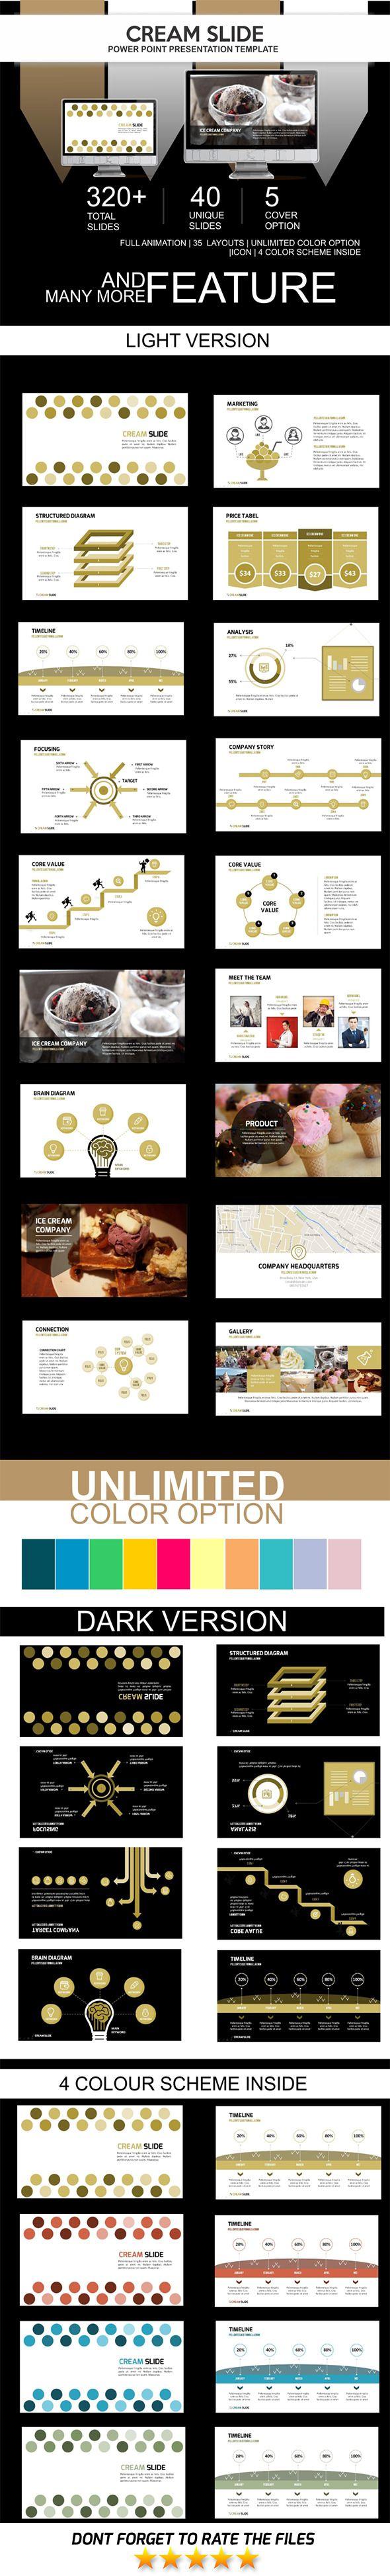 Cream Slide PowerPoint Template #design Download: http://graphicriver.net/item/cream-slide/11569401?ref=ksioks